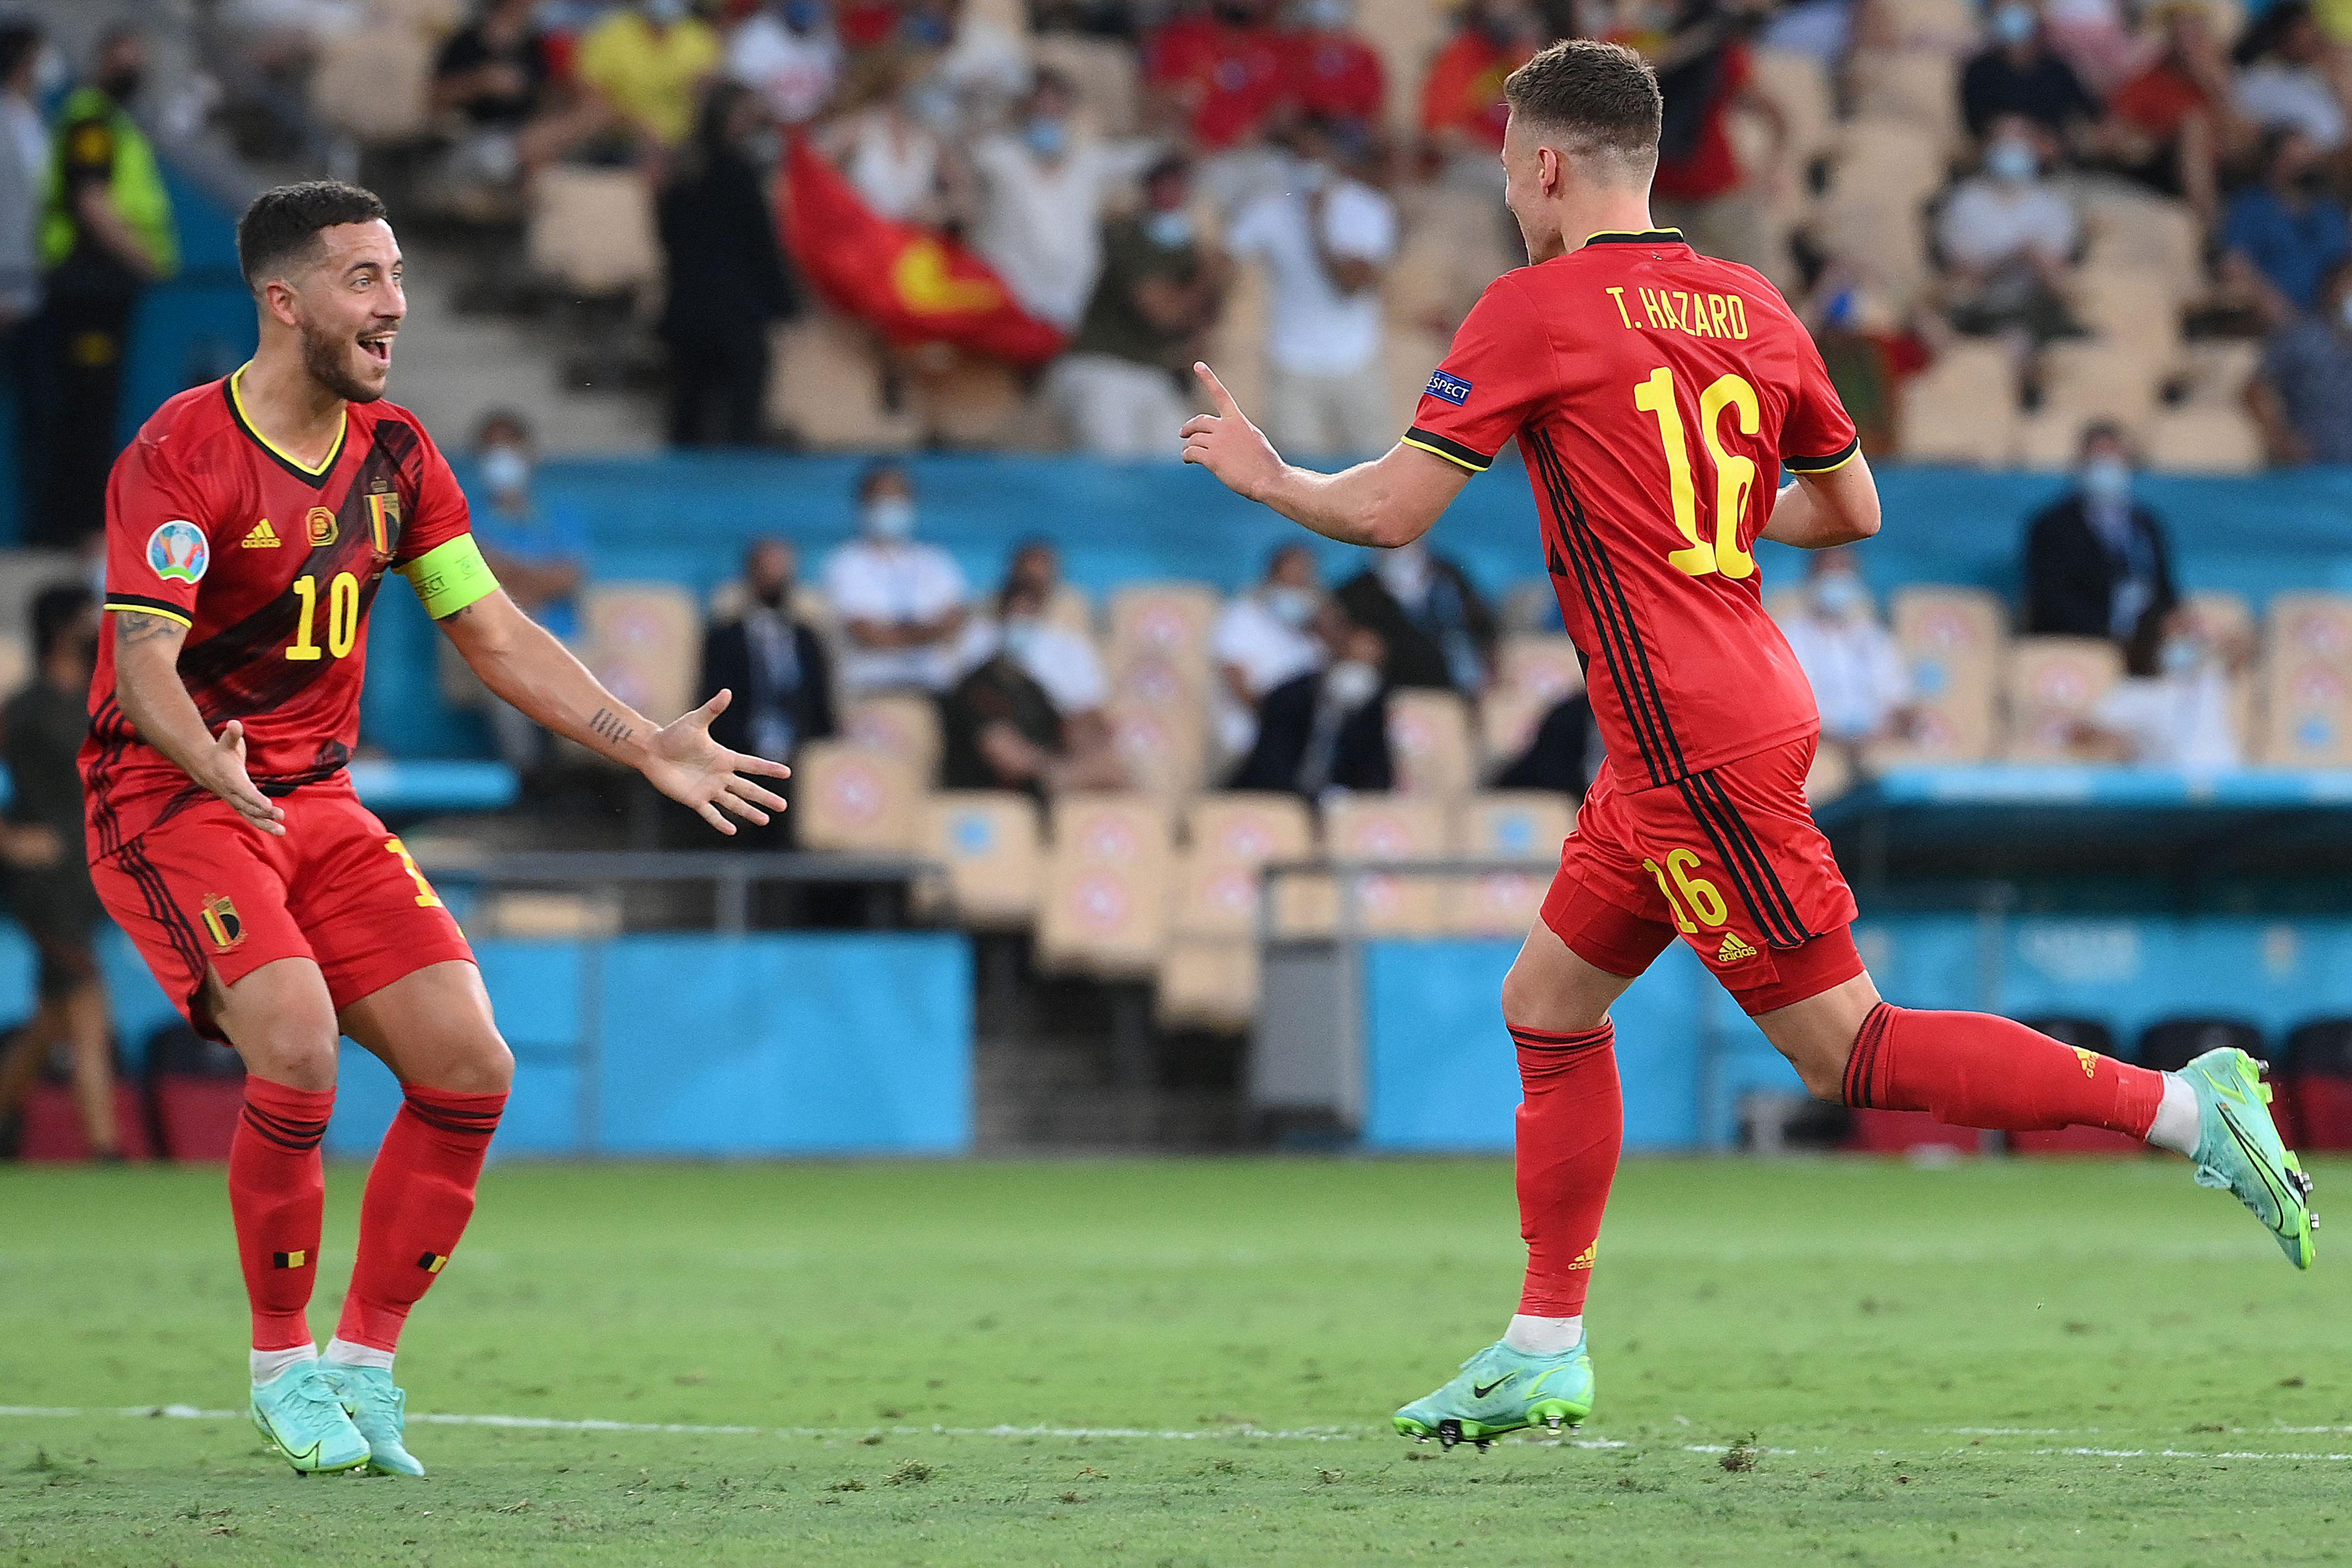 Bélgica a los cuartos de final. Foto: Twitter